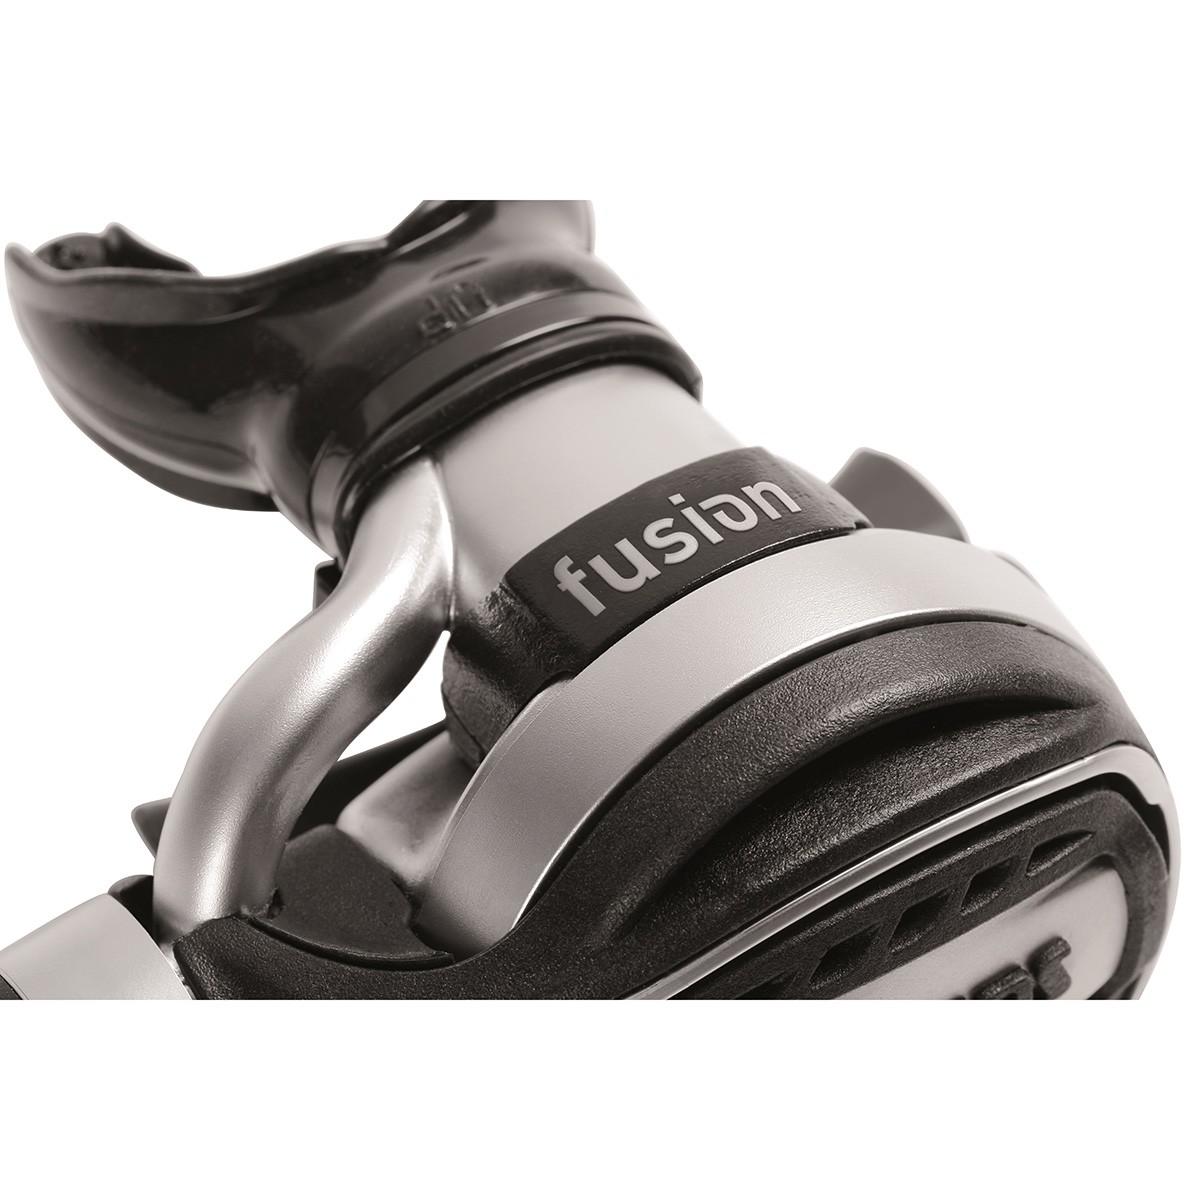 Mares Fusion 52X Regulator Top Detail